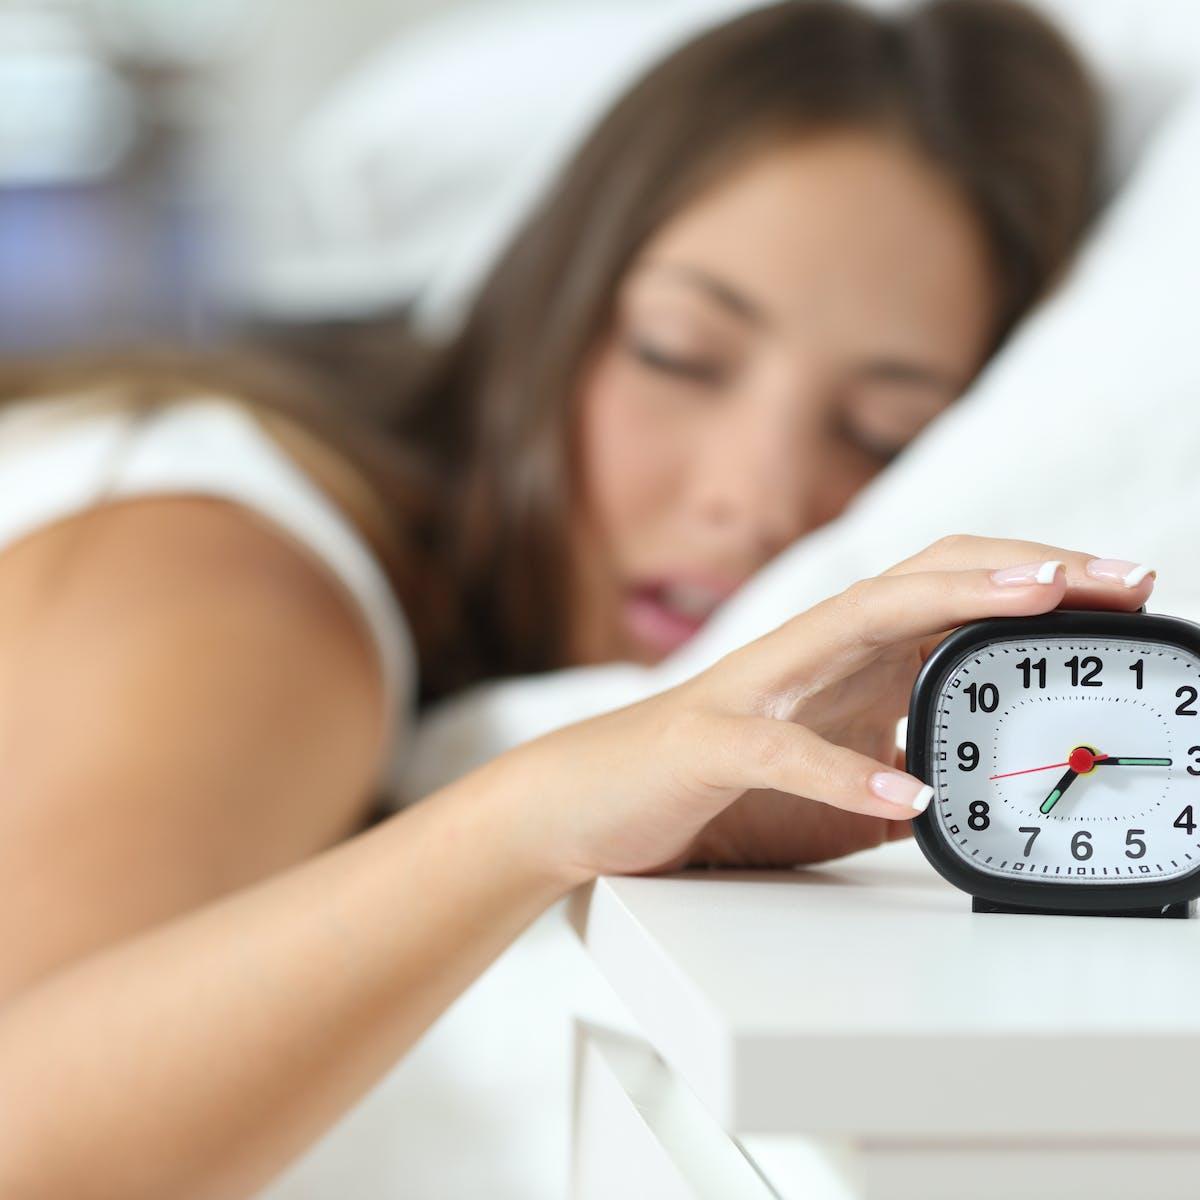 Sleepy teenage brains need school to start later in the morning